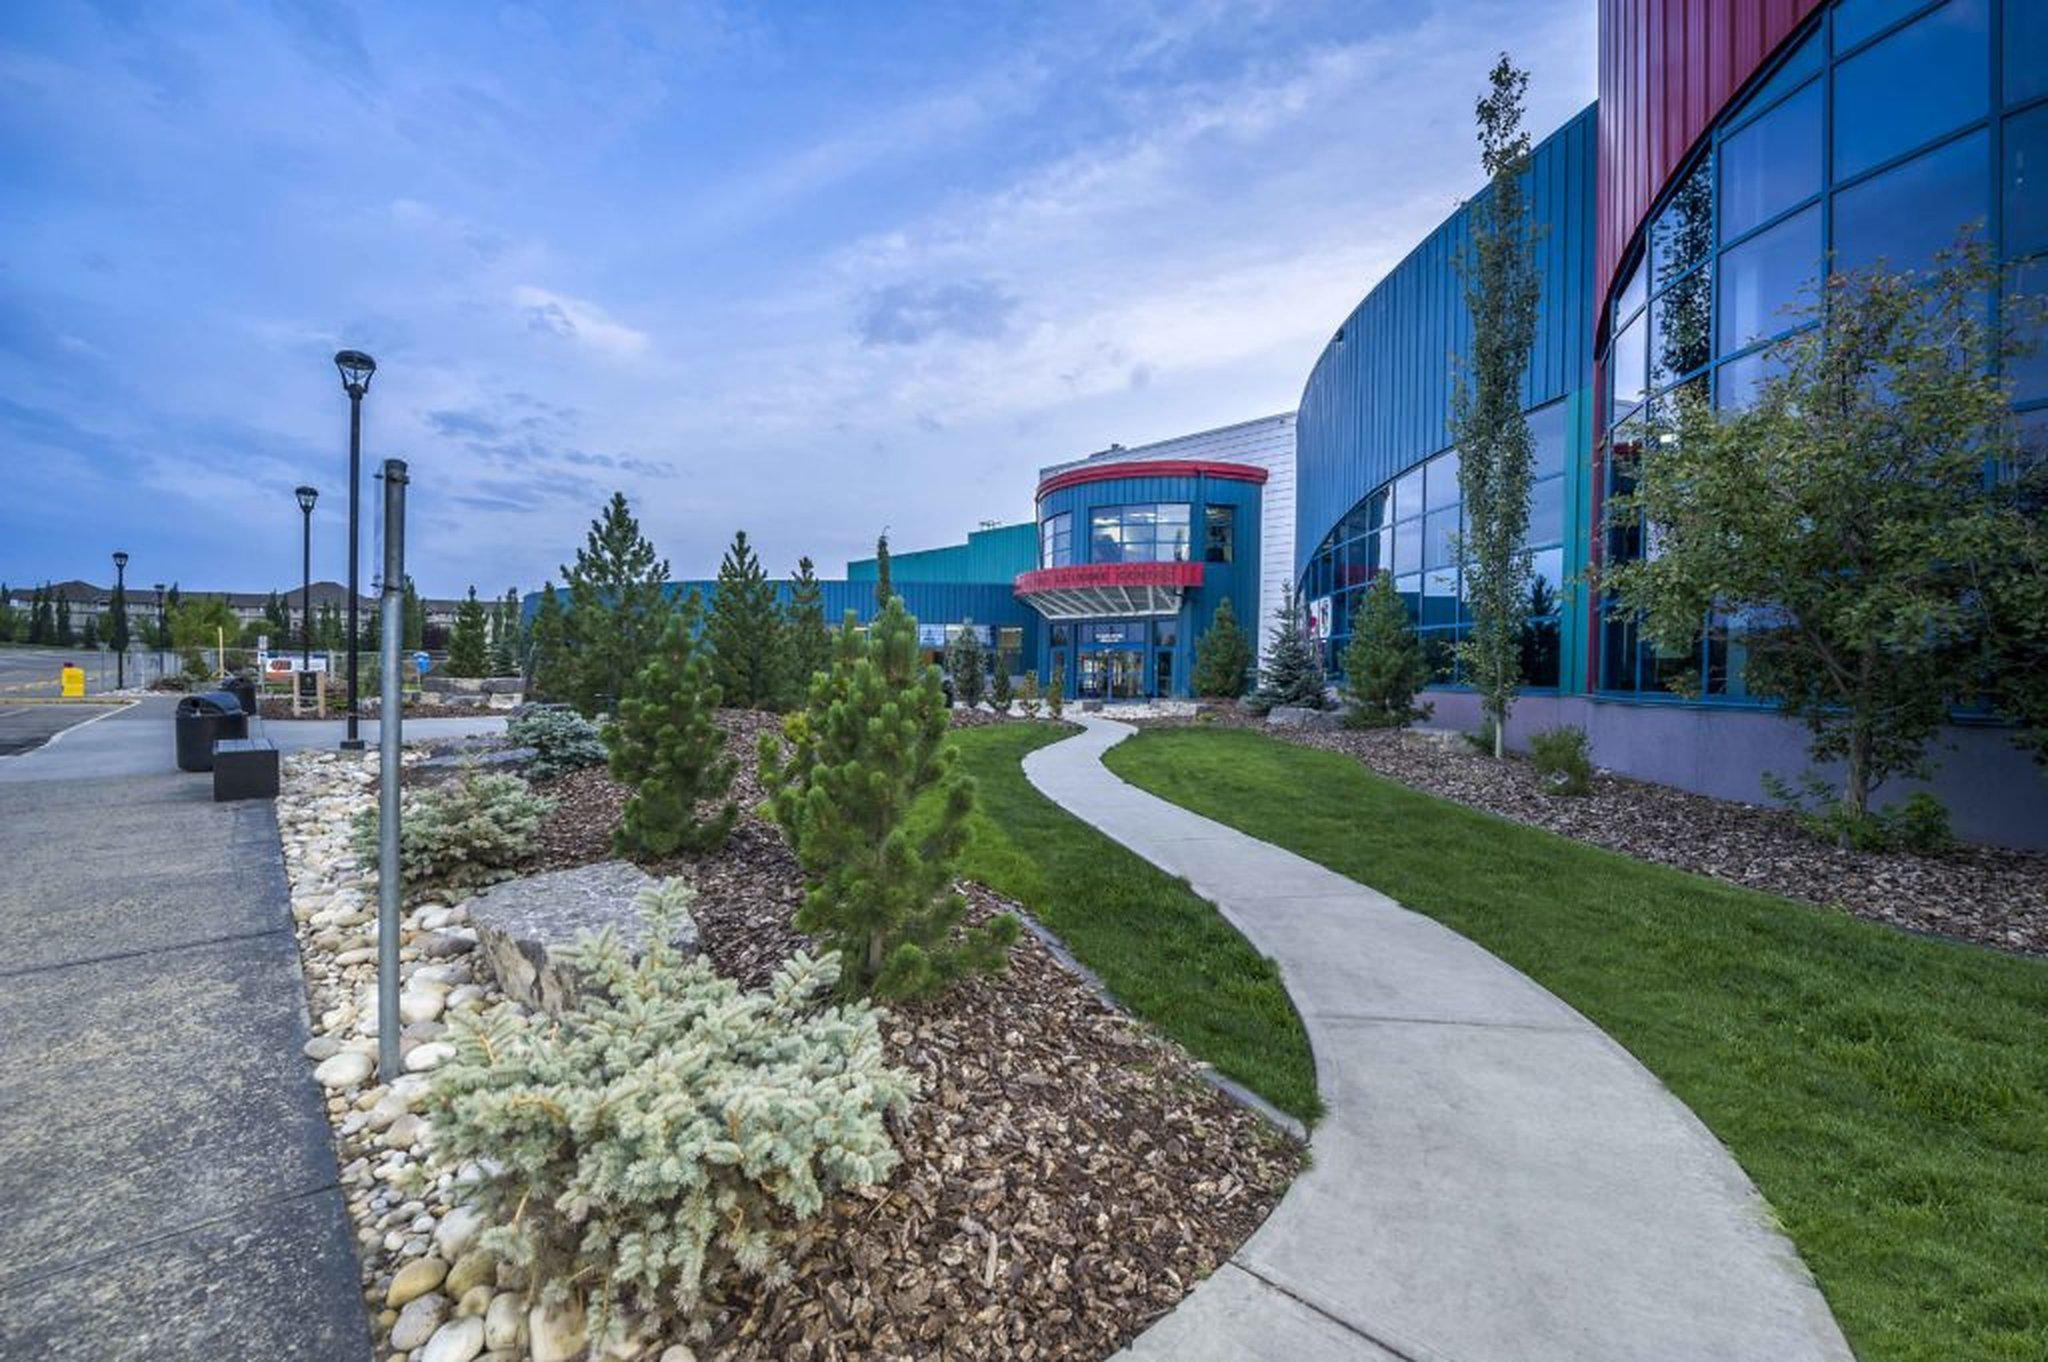 Holiday Inn Express & Suites Spruce Grove - Stony Plain